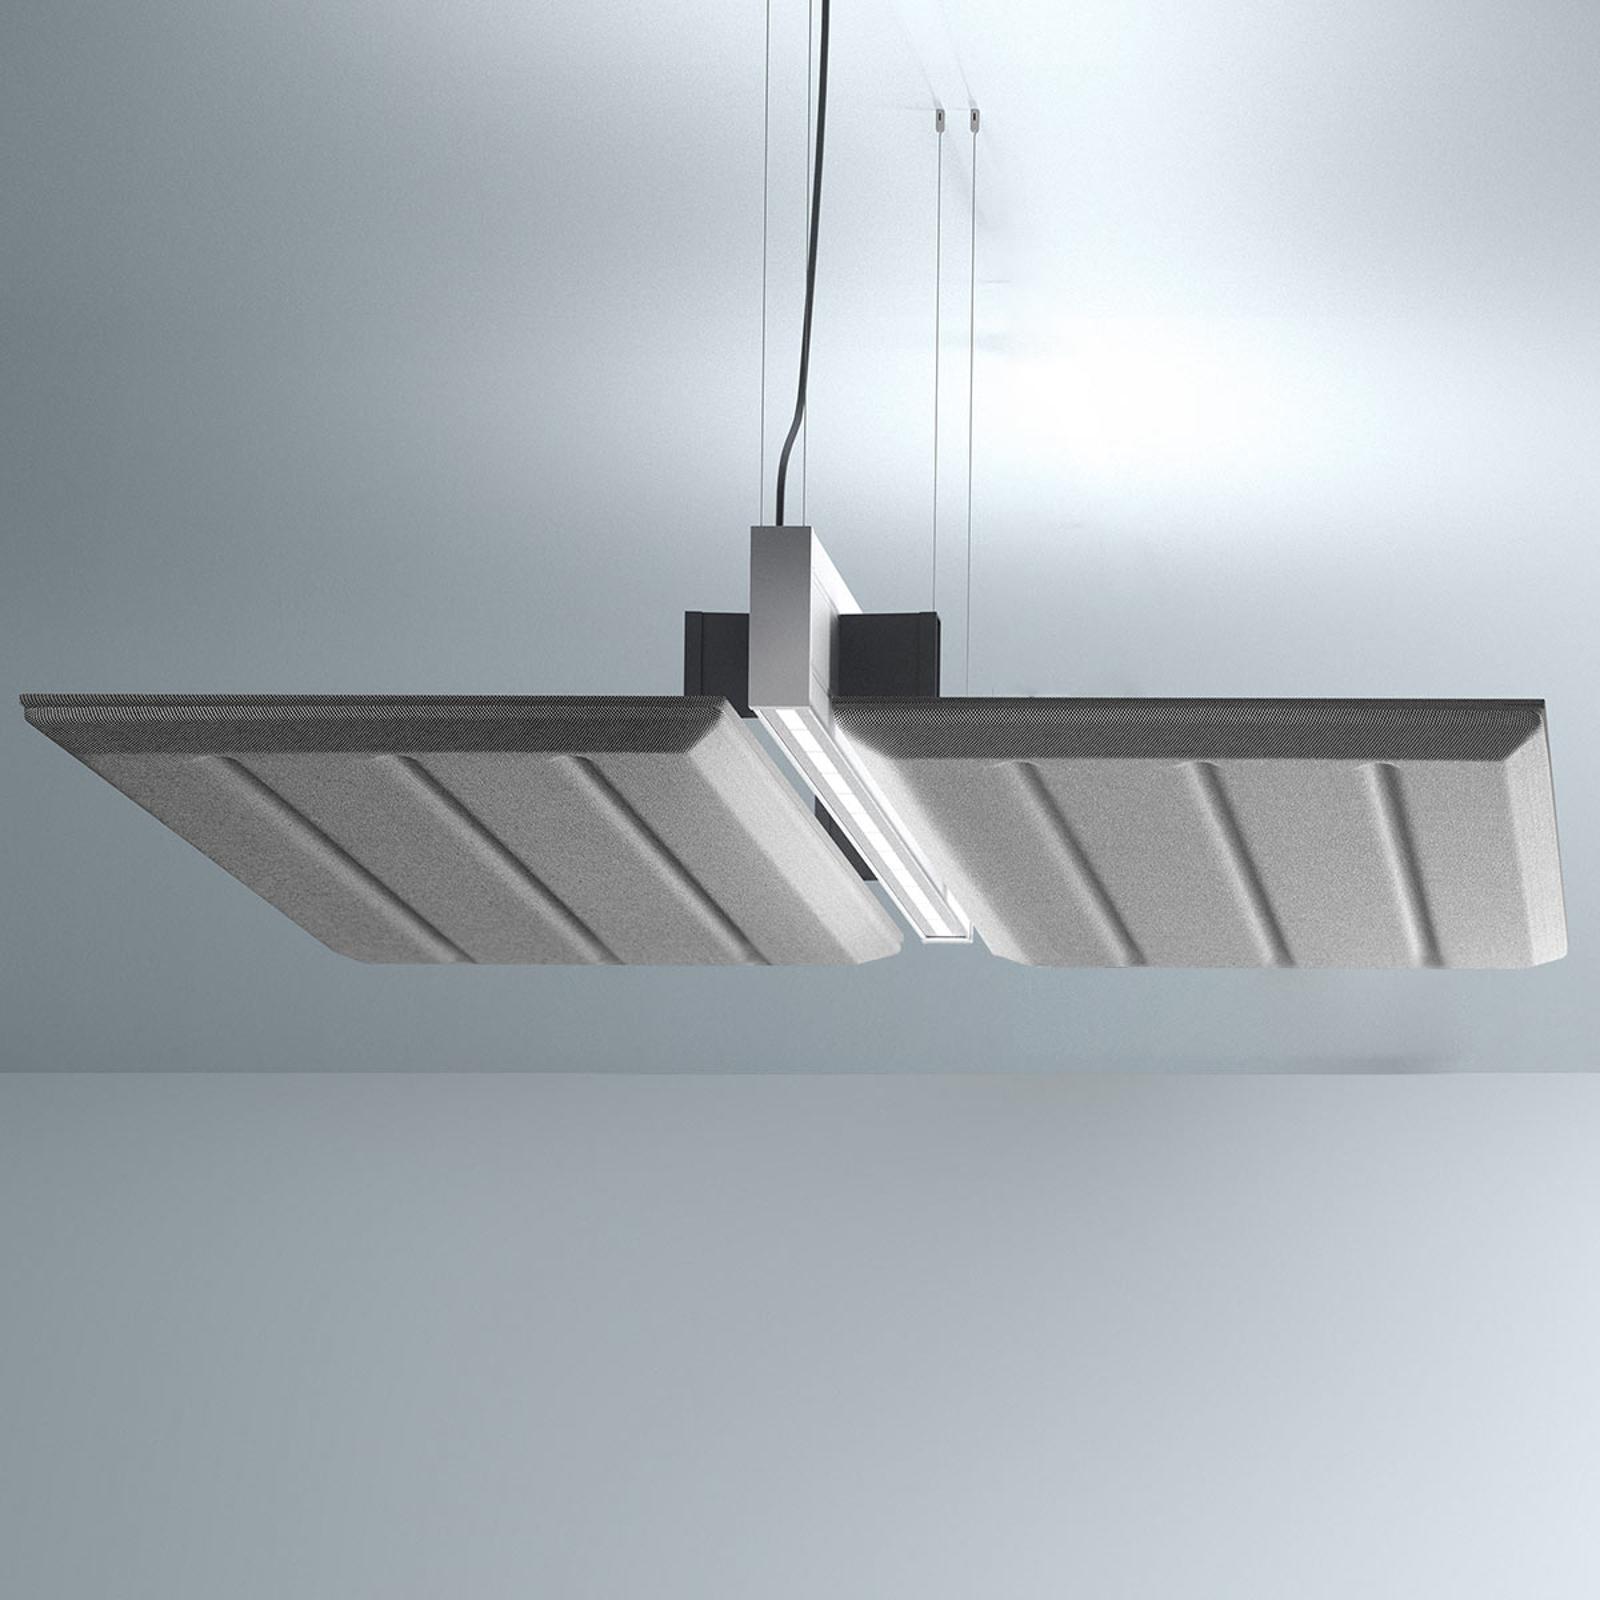 Luceplan Diade hanglamp horizontaal Ø 120cm zwart